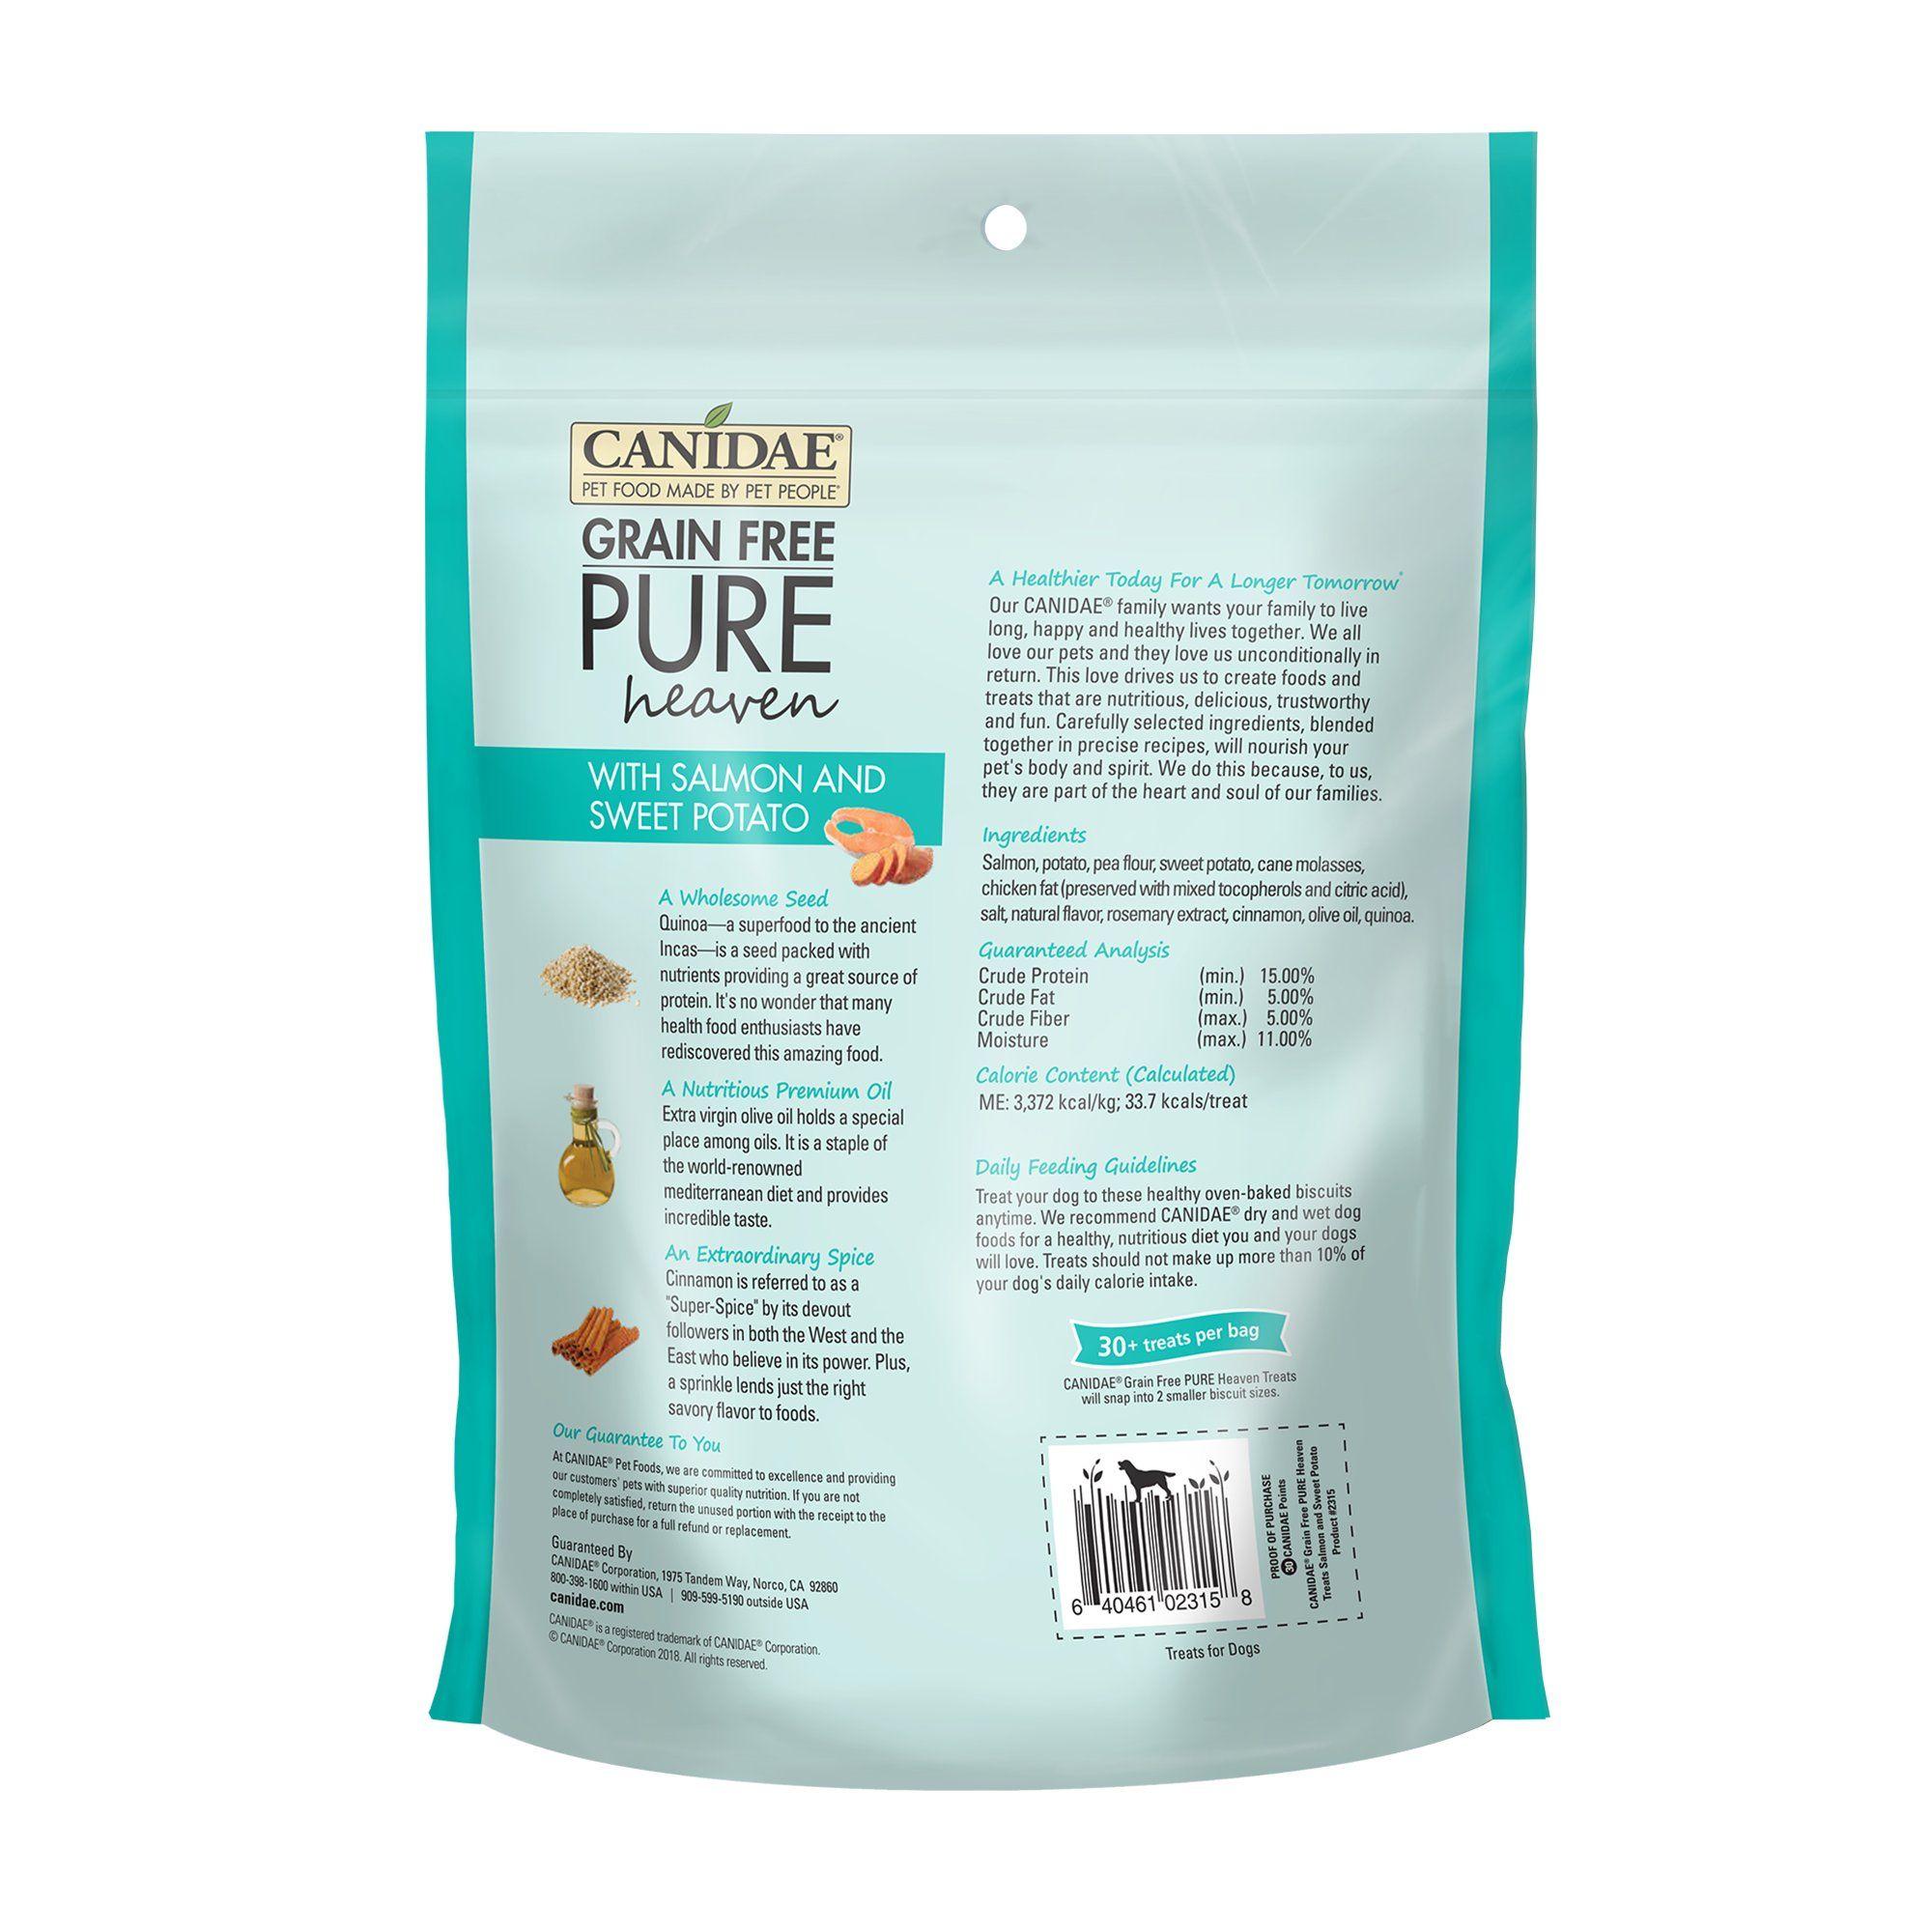 Canidae grain free pure heaven with salmon sweet potato